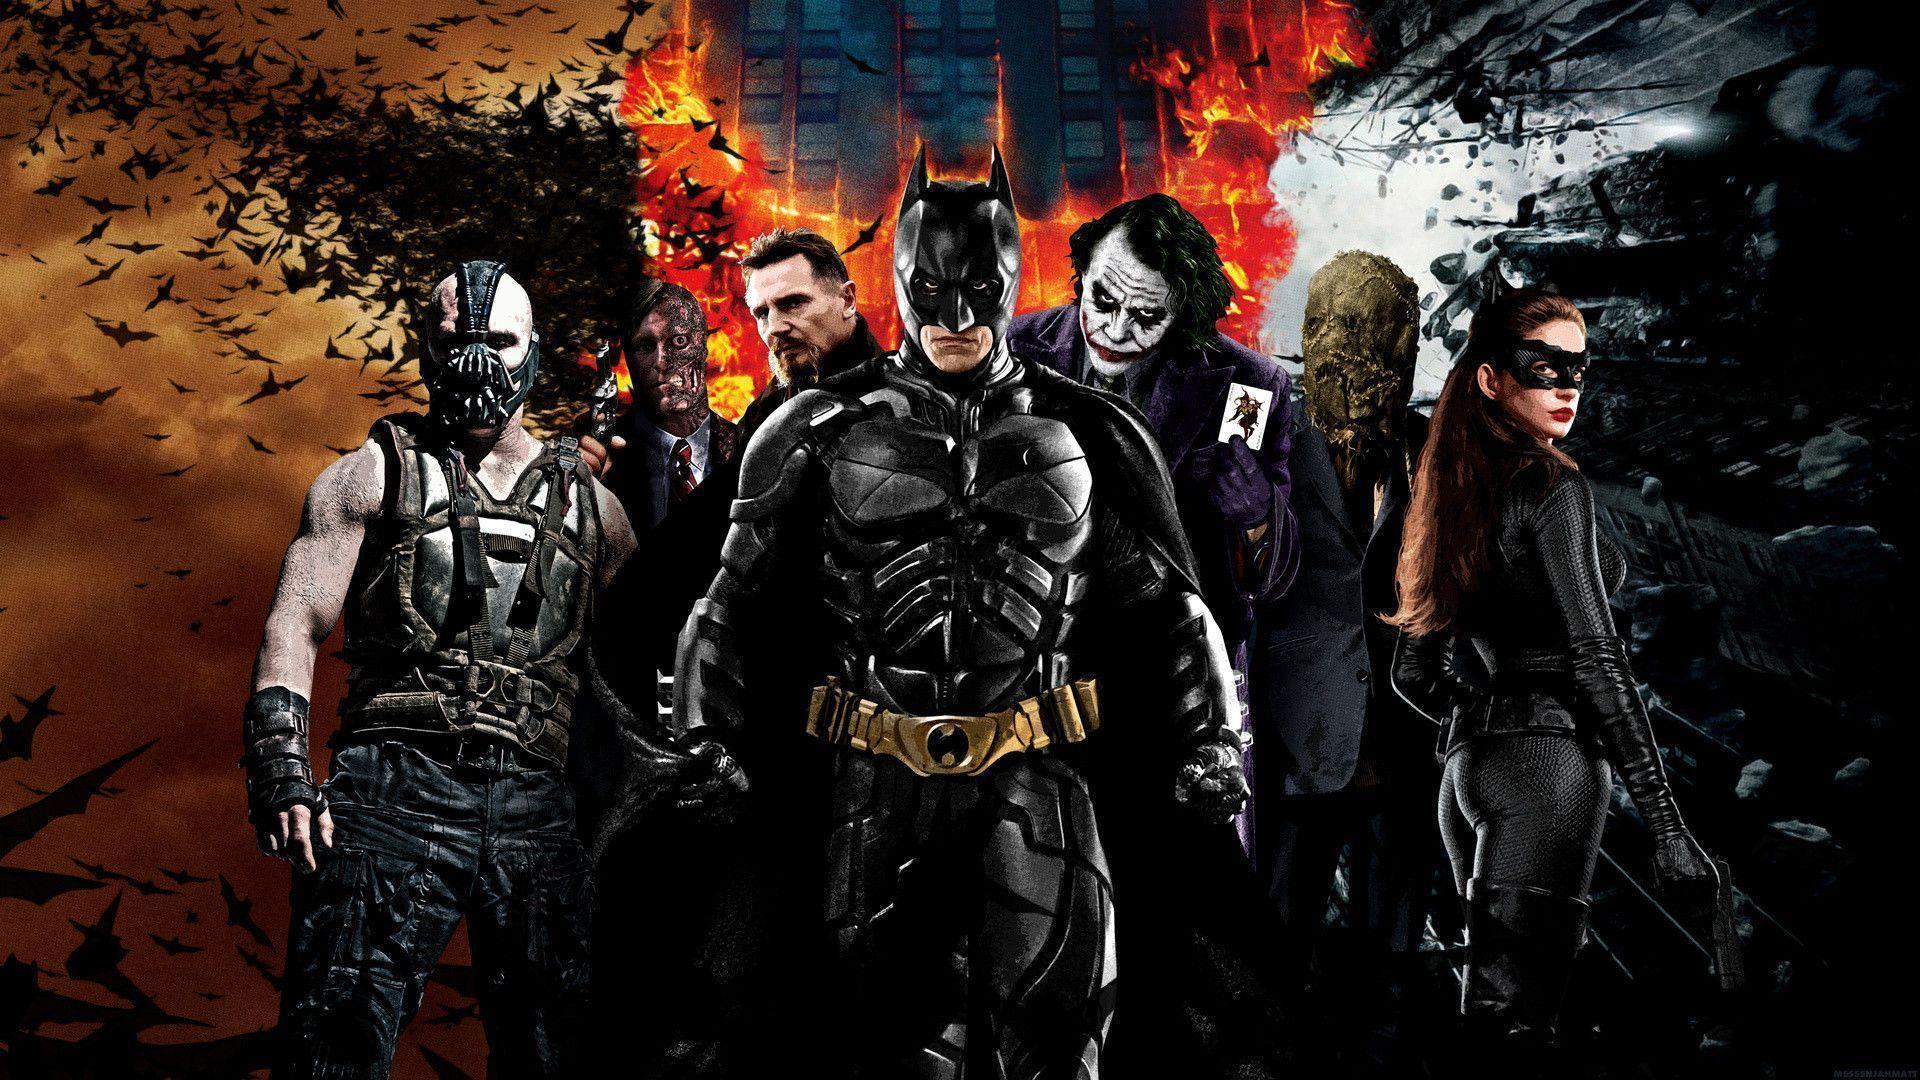 Batman Movie Characters Wallpaper